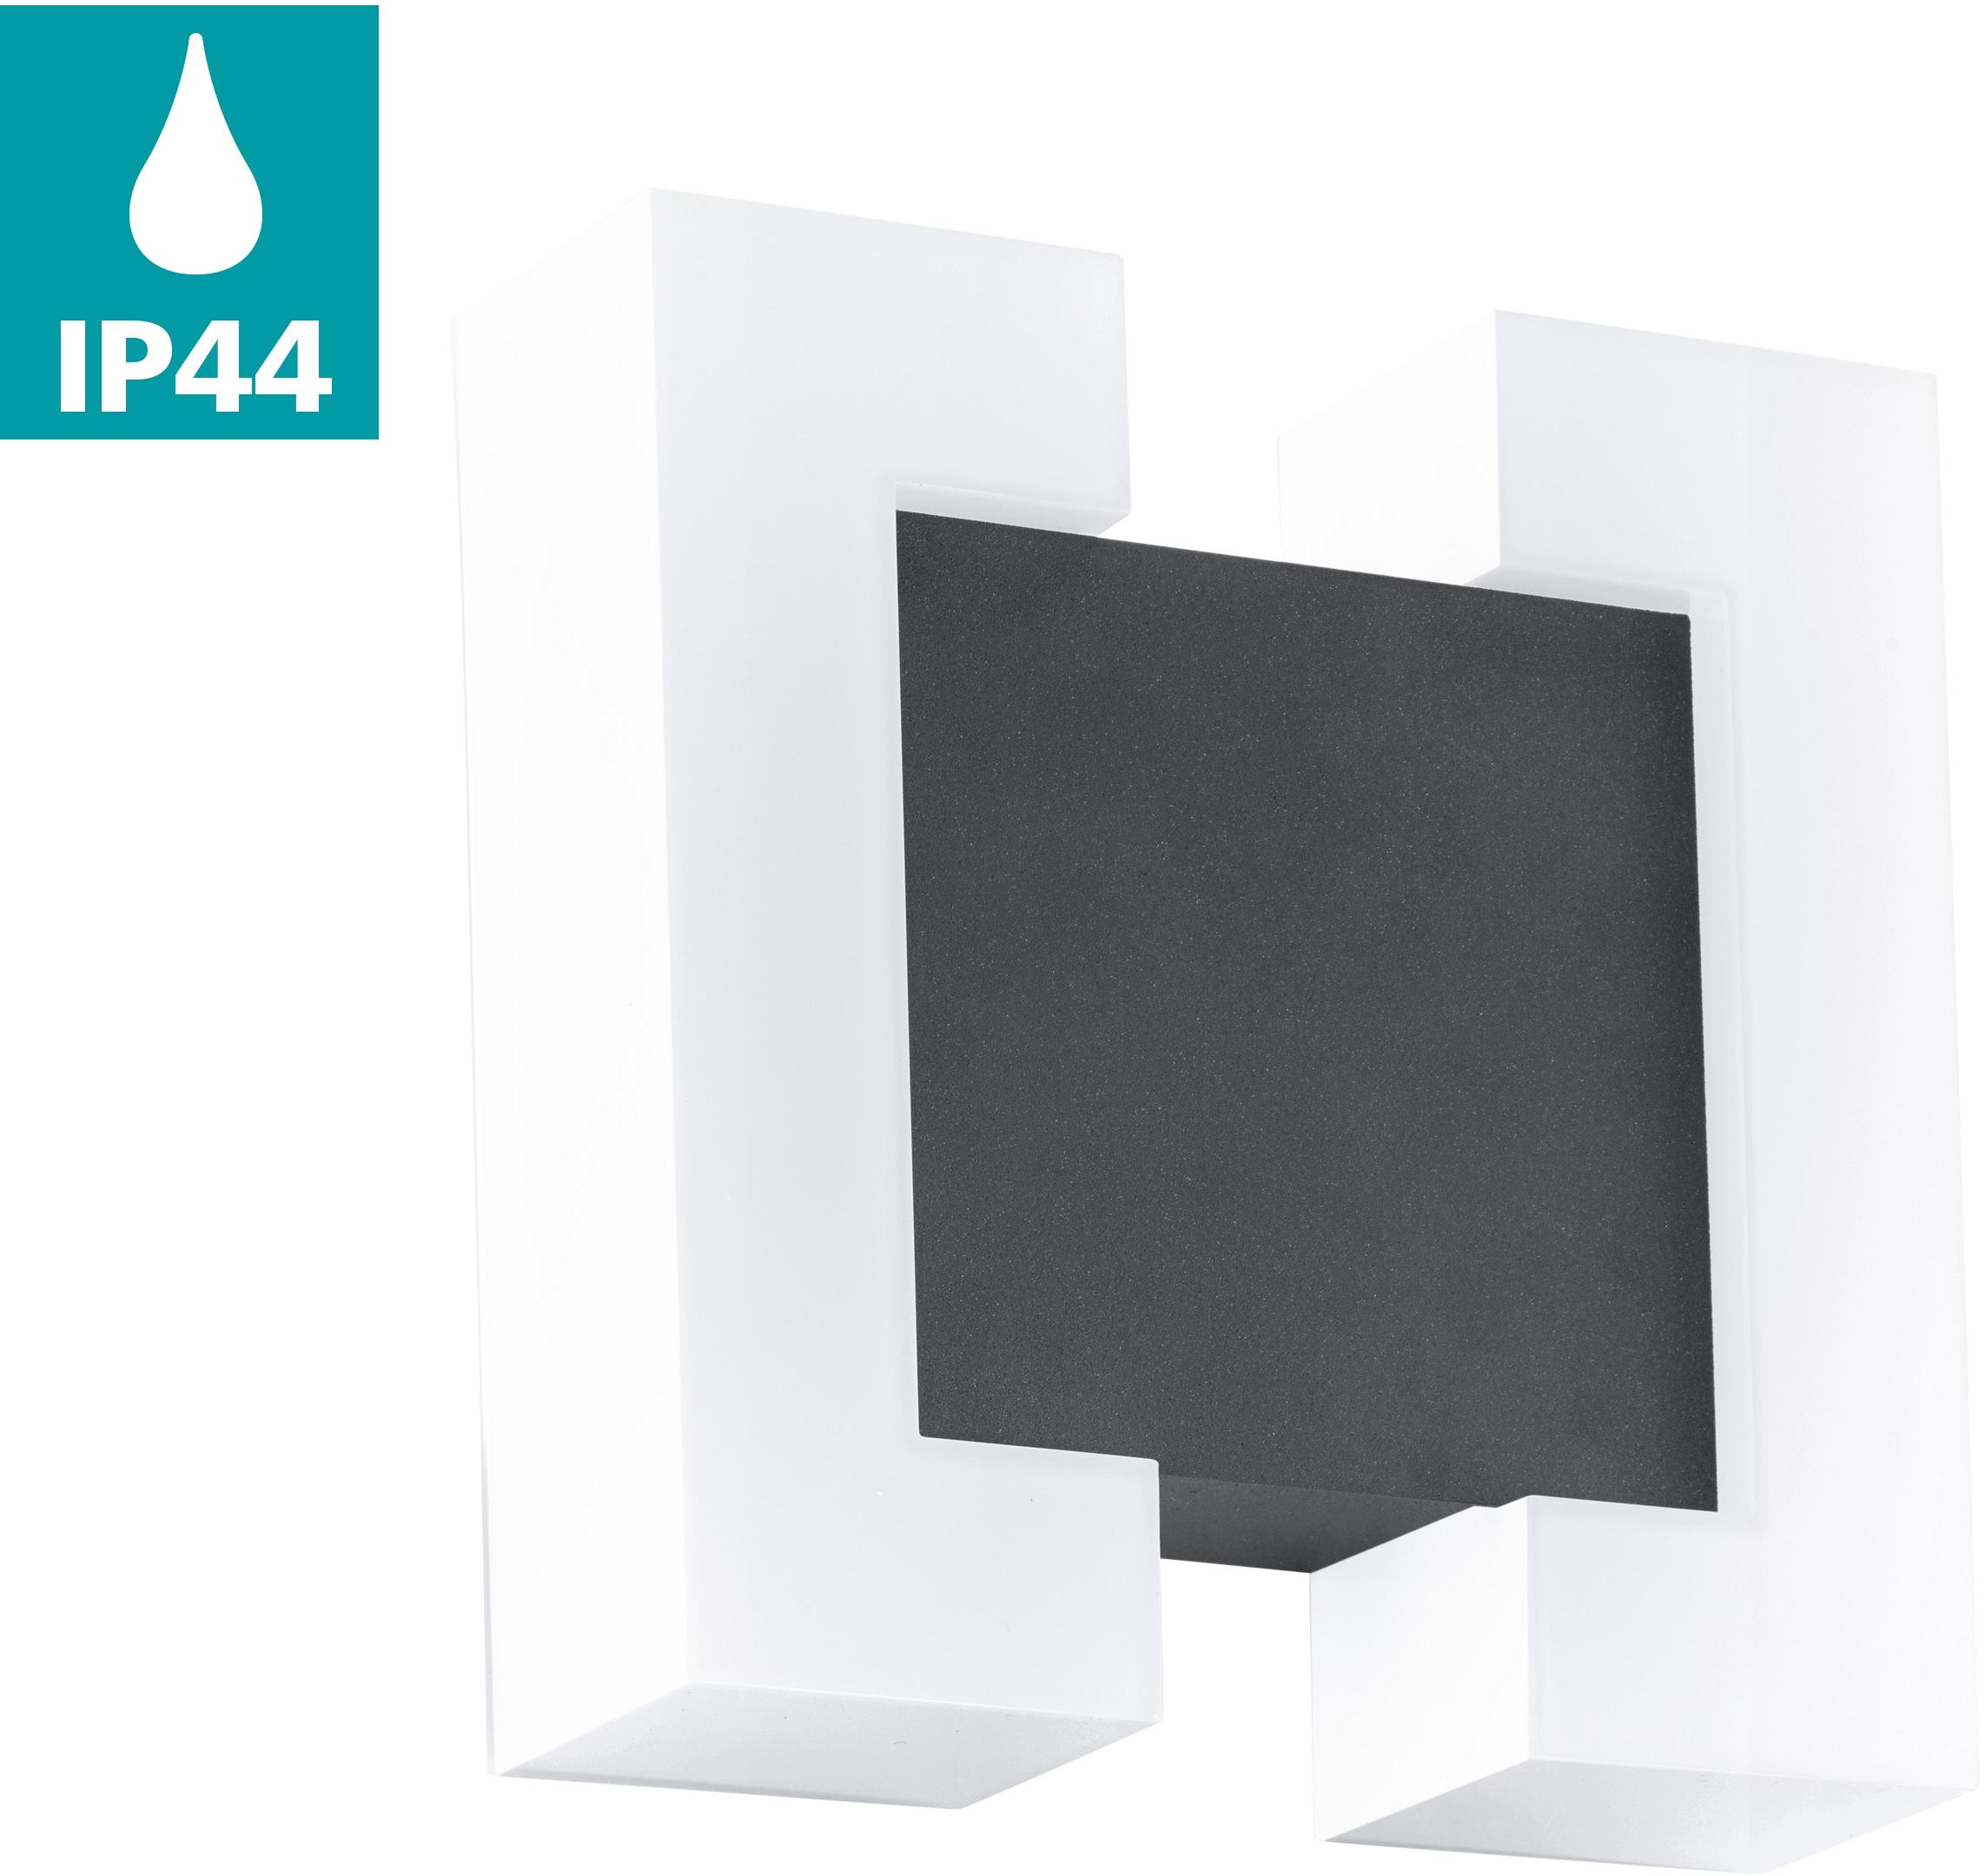 EGLO LED Außen-Wandleuchte SITIA, LED-Board, Warmweiß, LED tauschbar